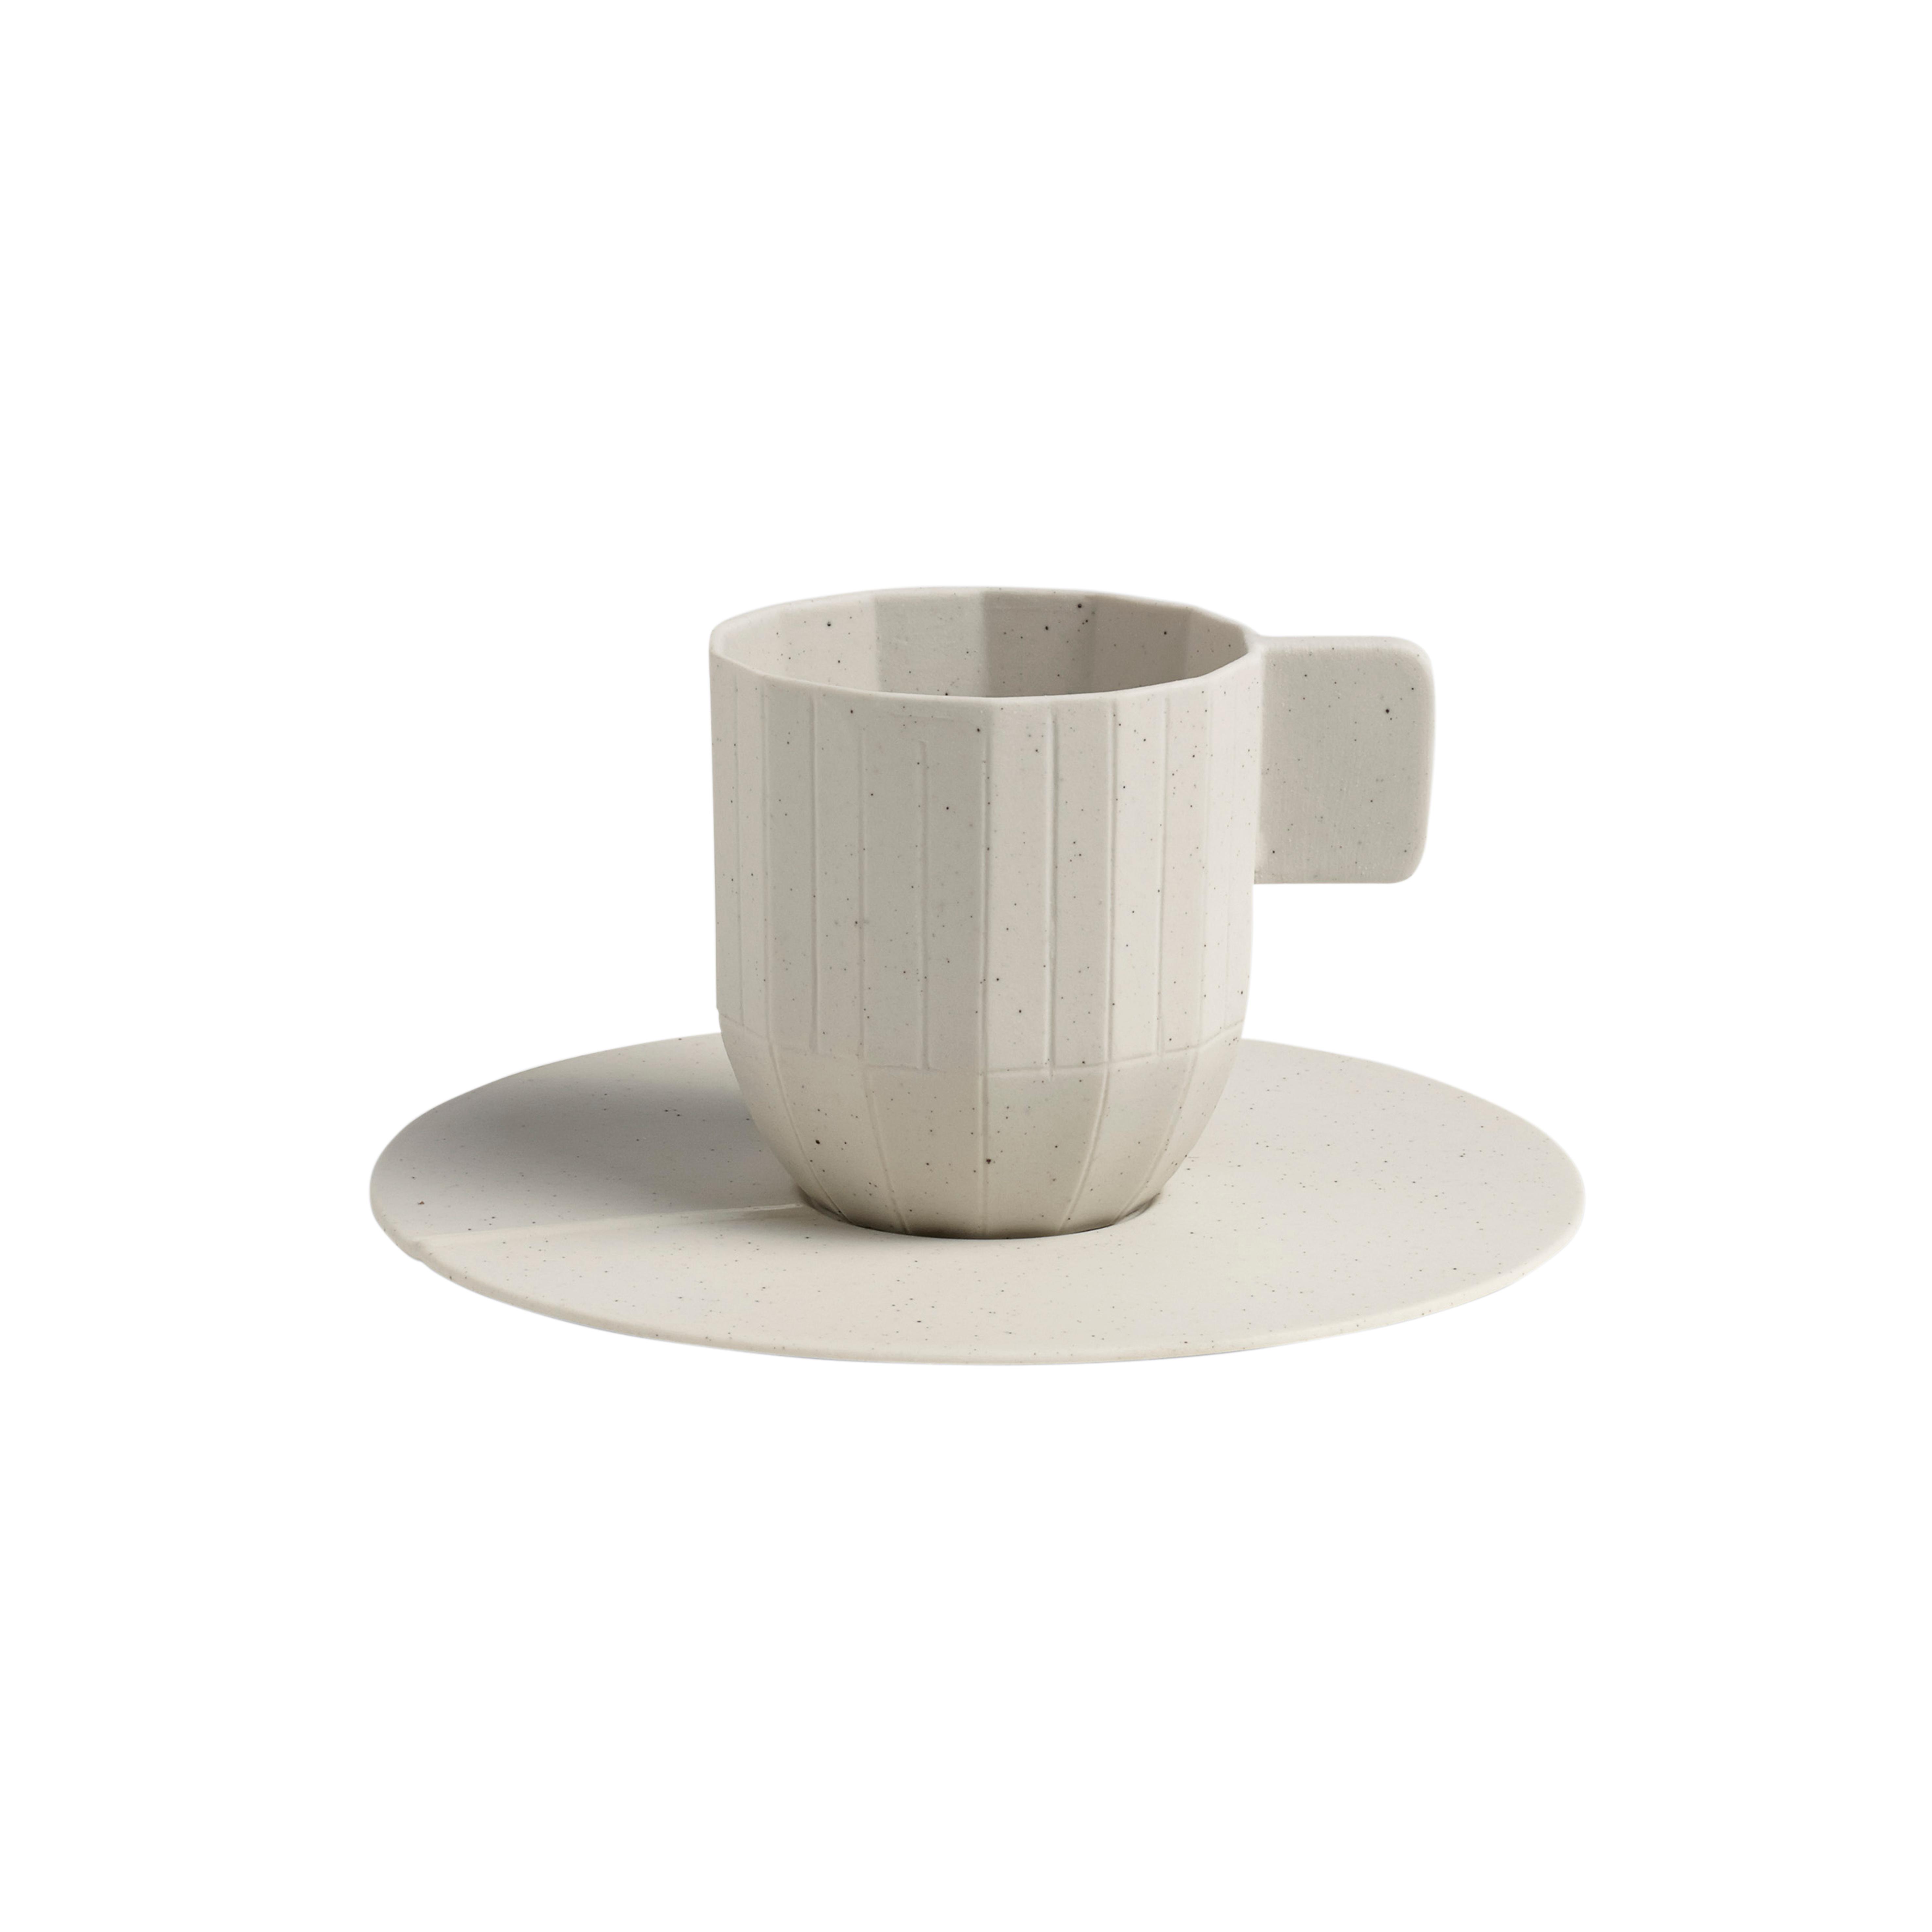 HAY Paper Porcelain Espresso Cup & Saucer - Grey Paper Porcelain espresso cup, saucer